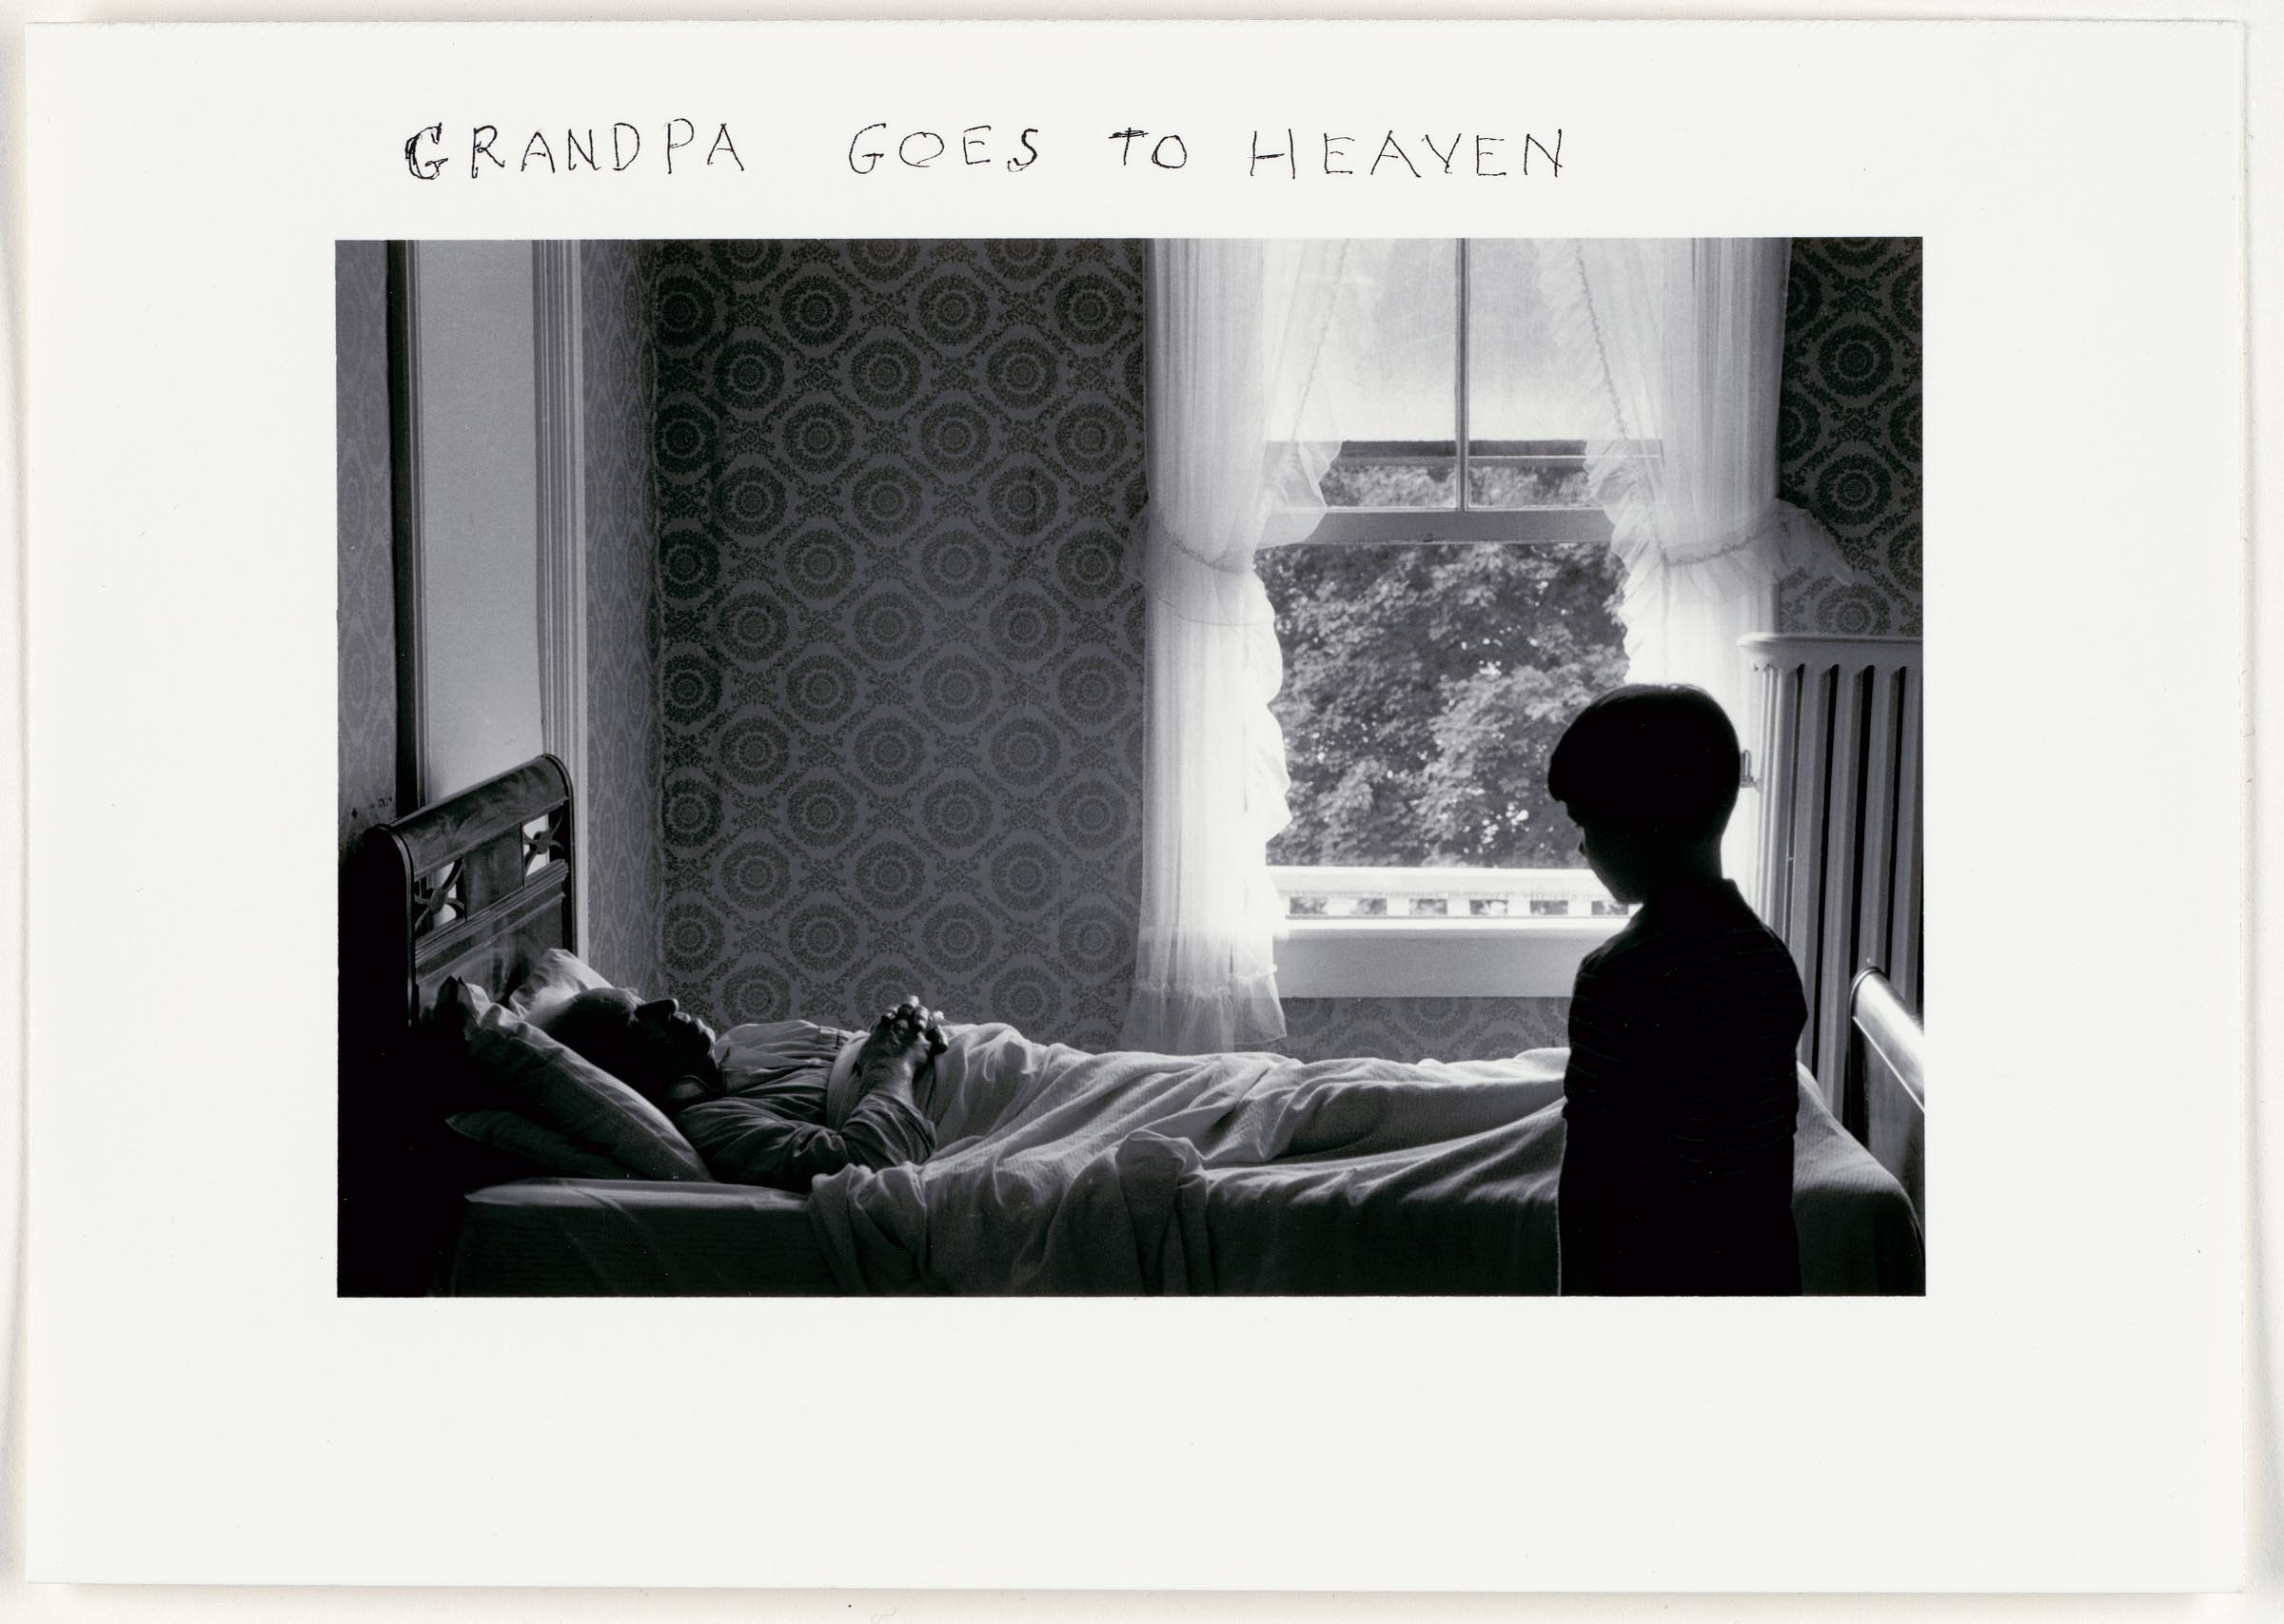 Grandpa1